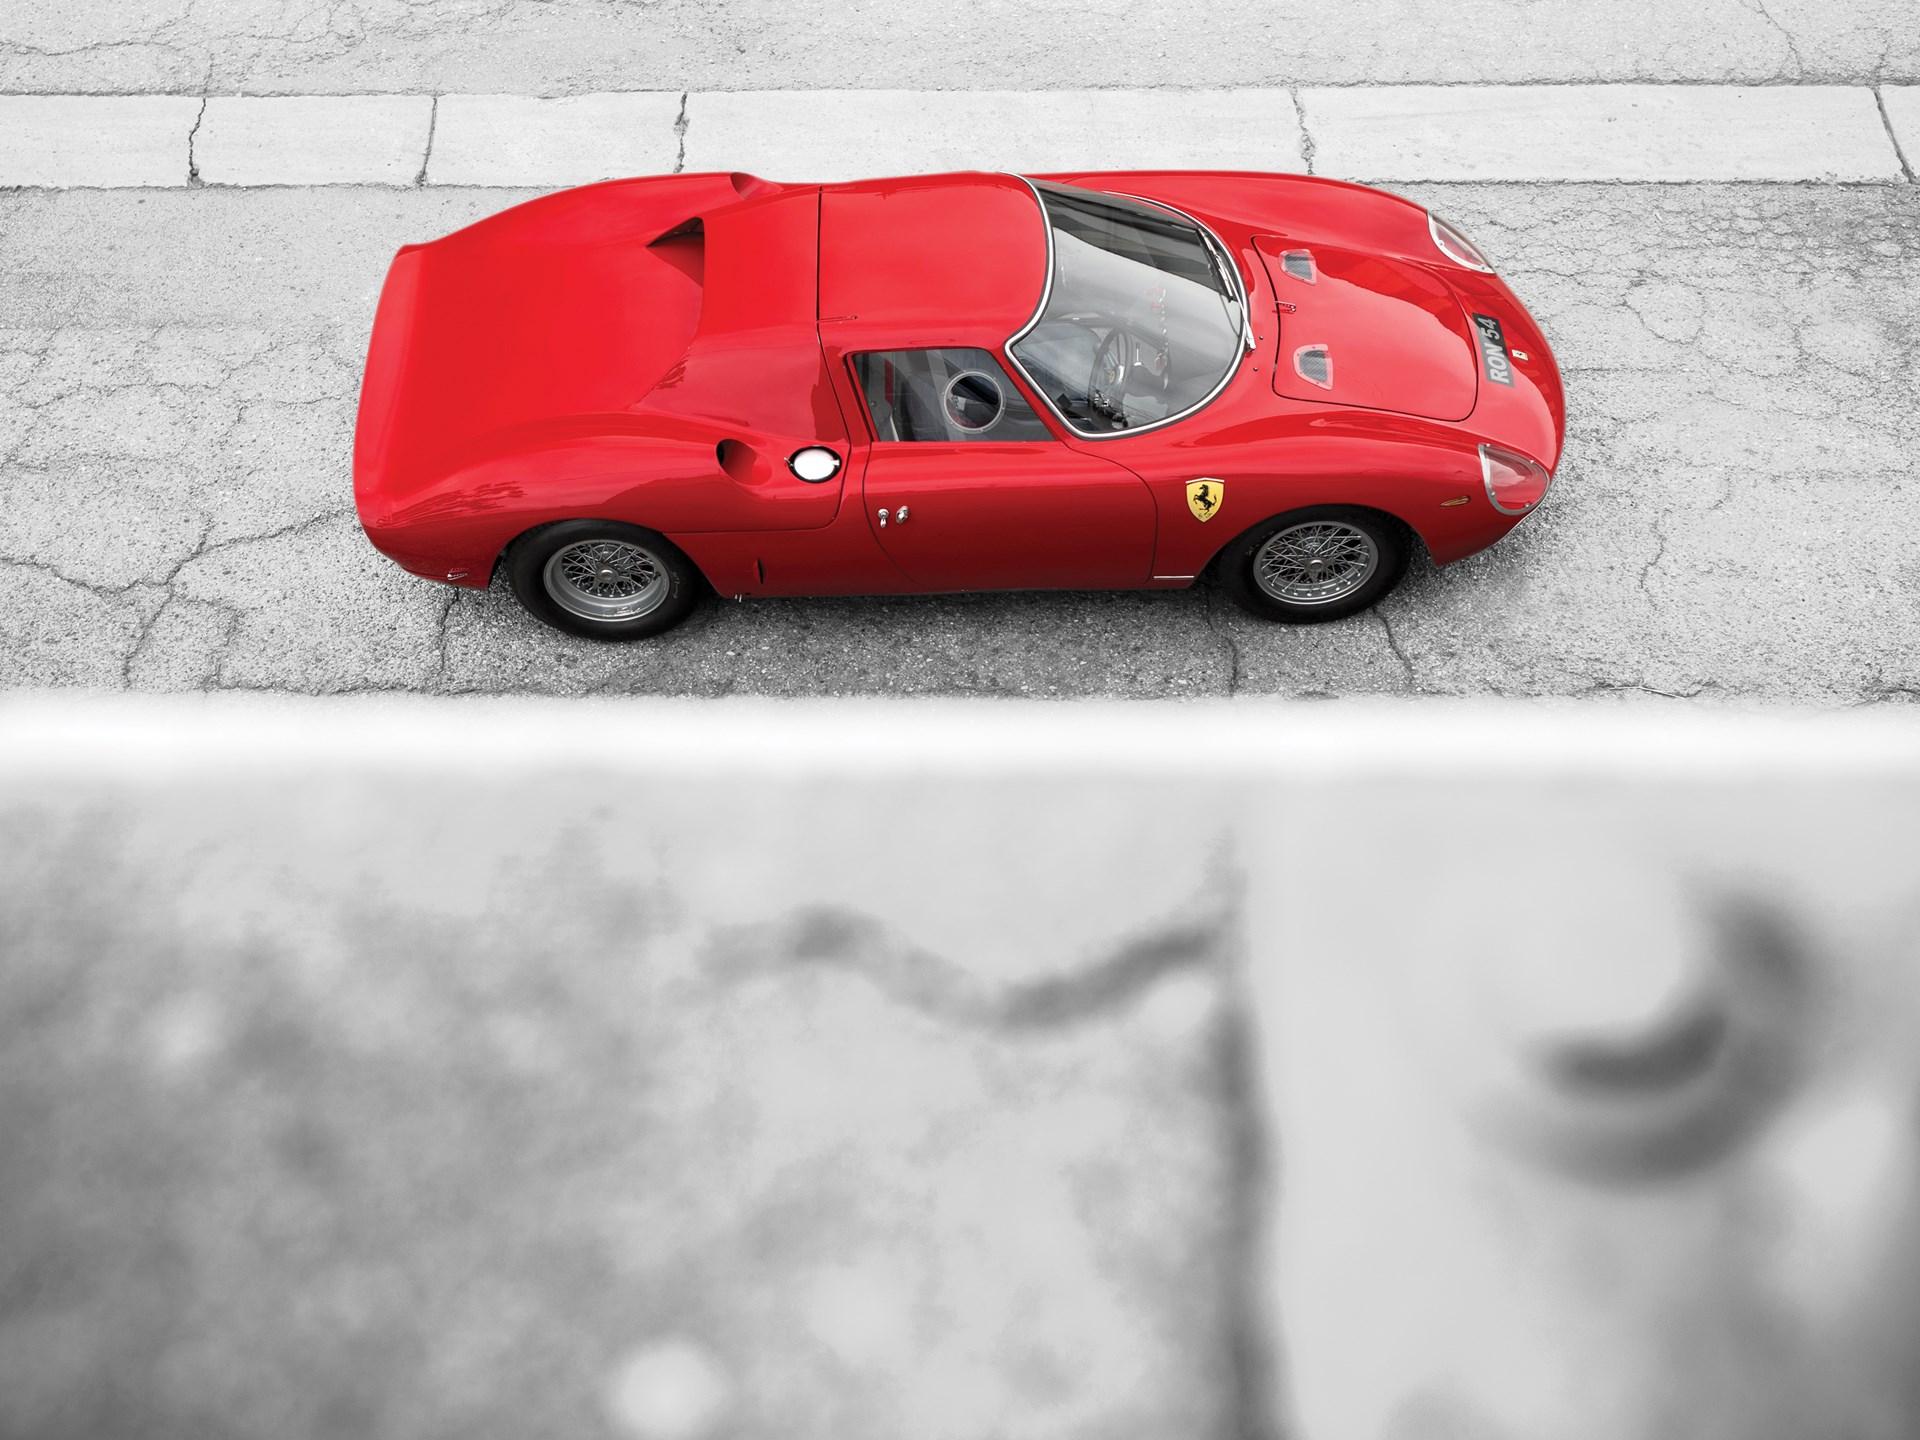 1964 Ferrari 250 LM by Scaglietti